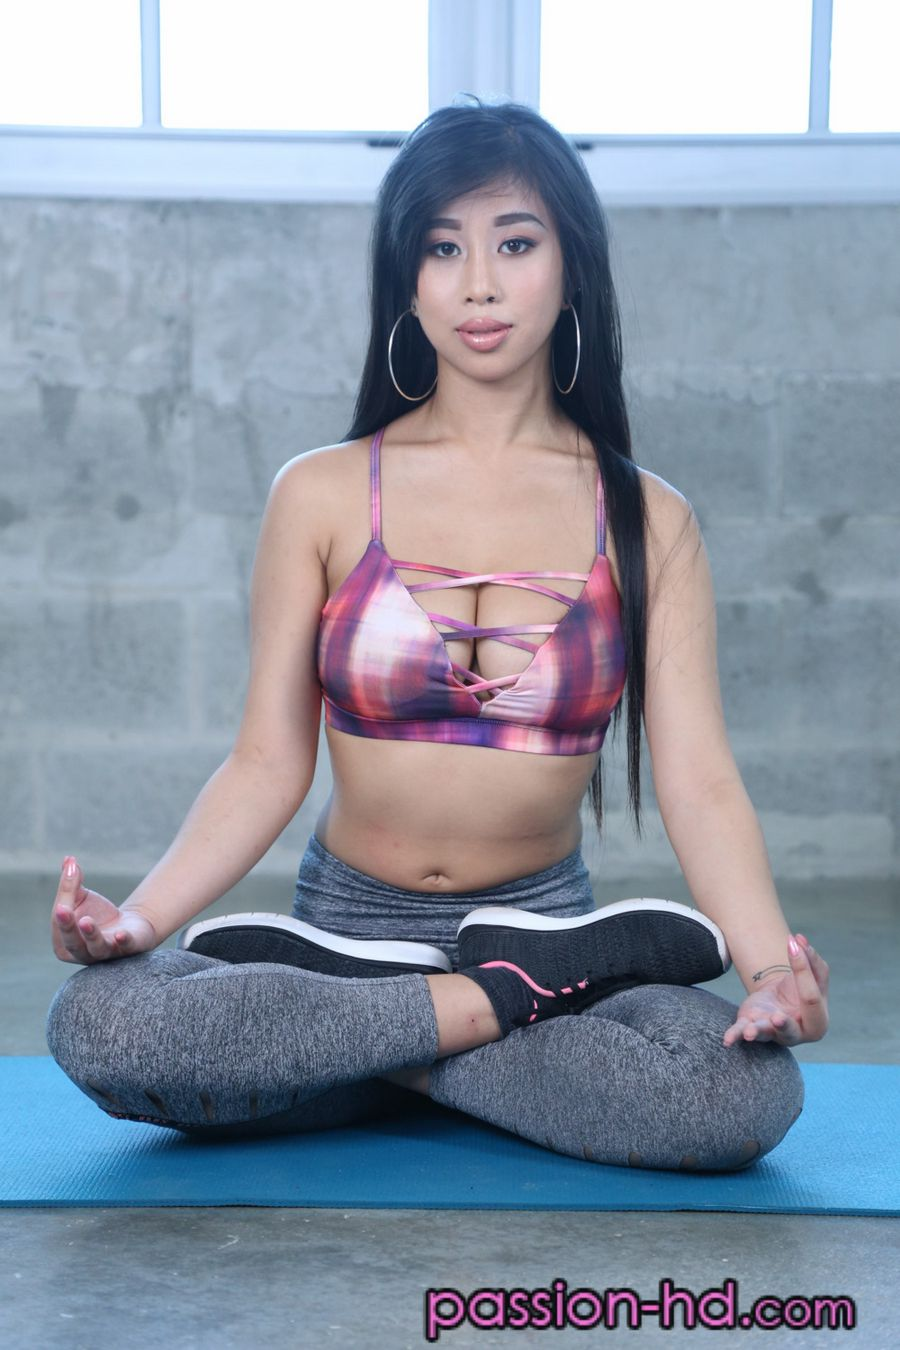 Namaste! Jade Kush will Put your Peen in a Yogo Pose